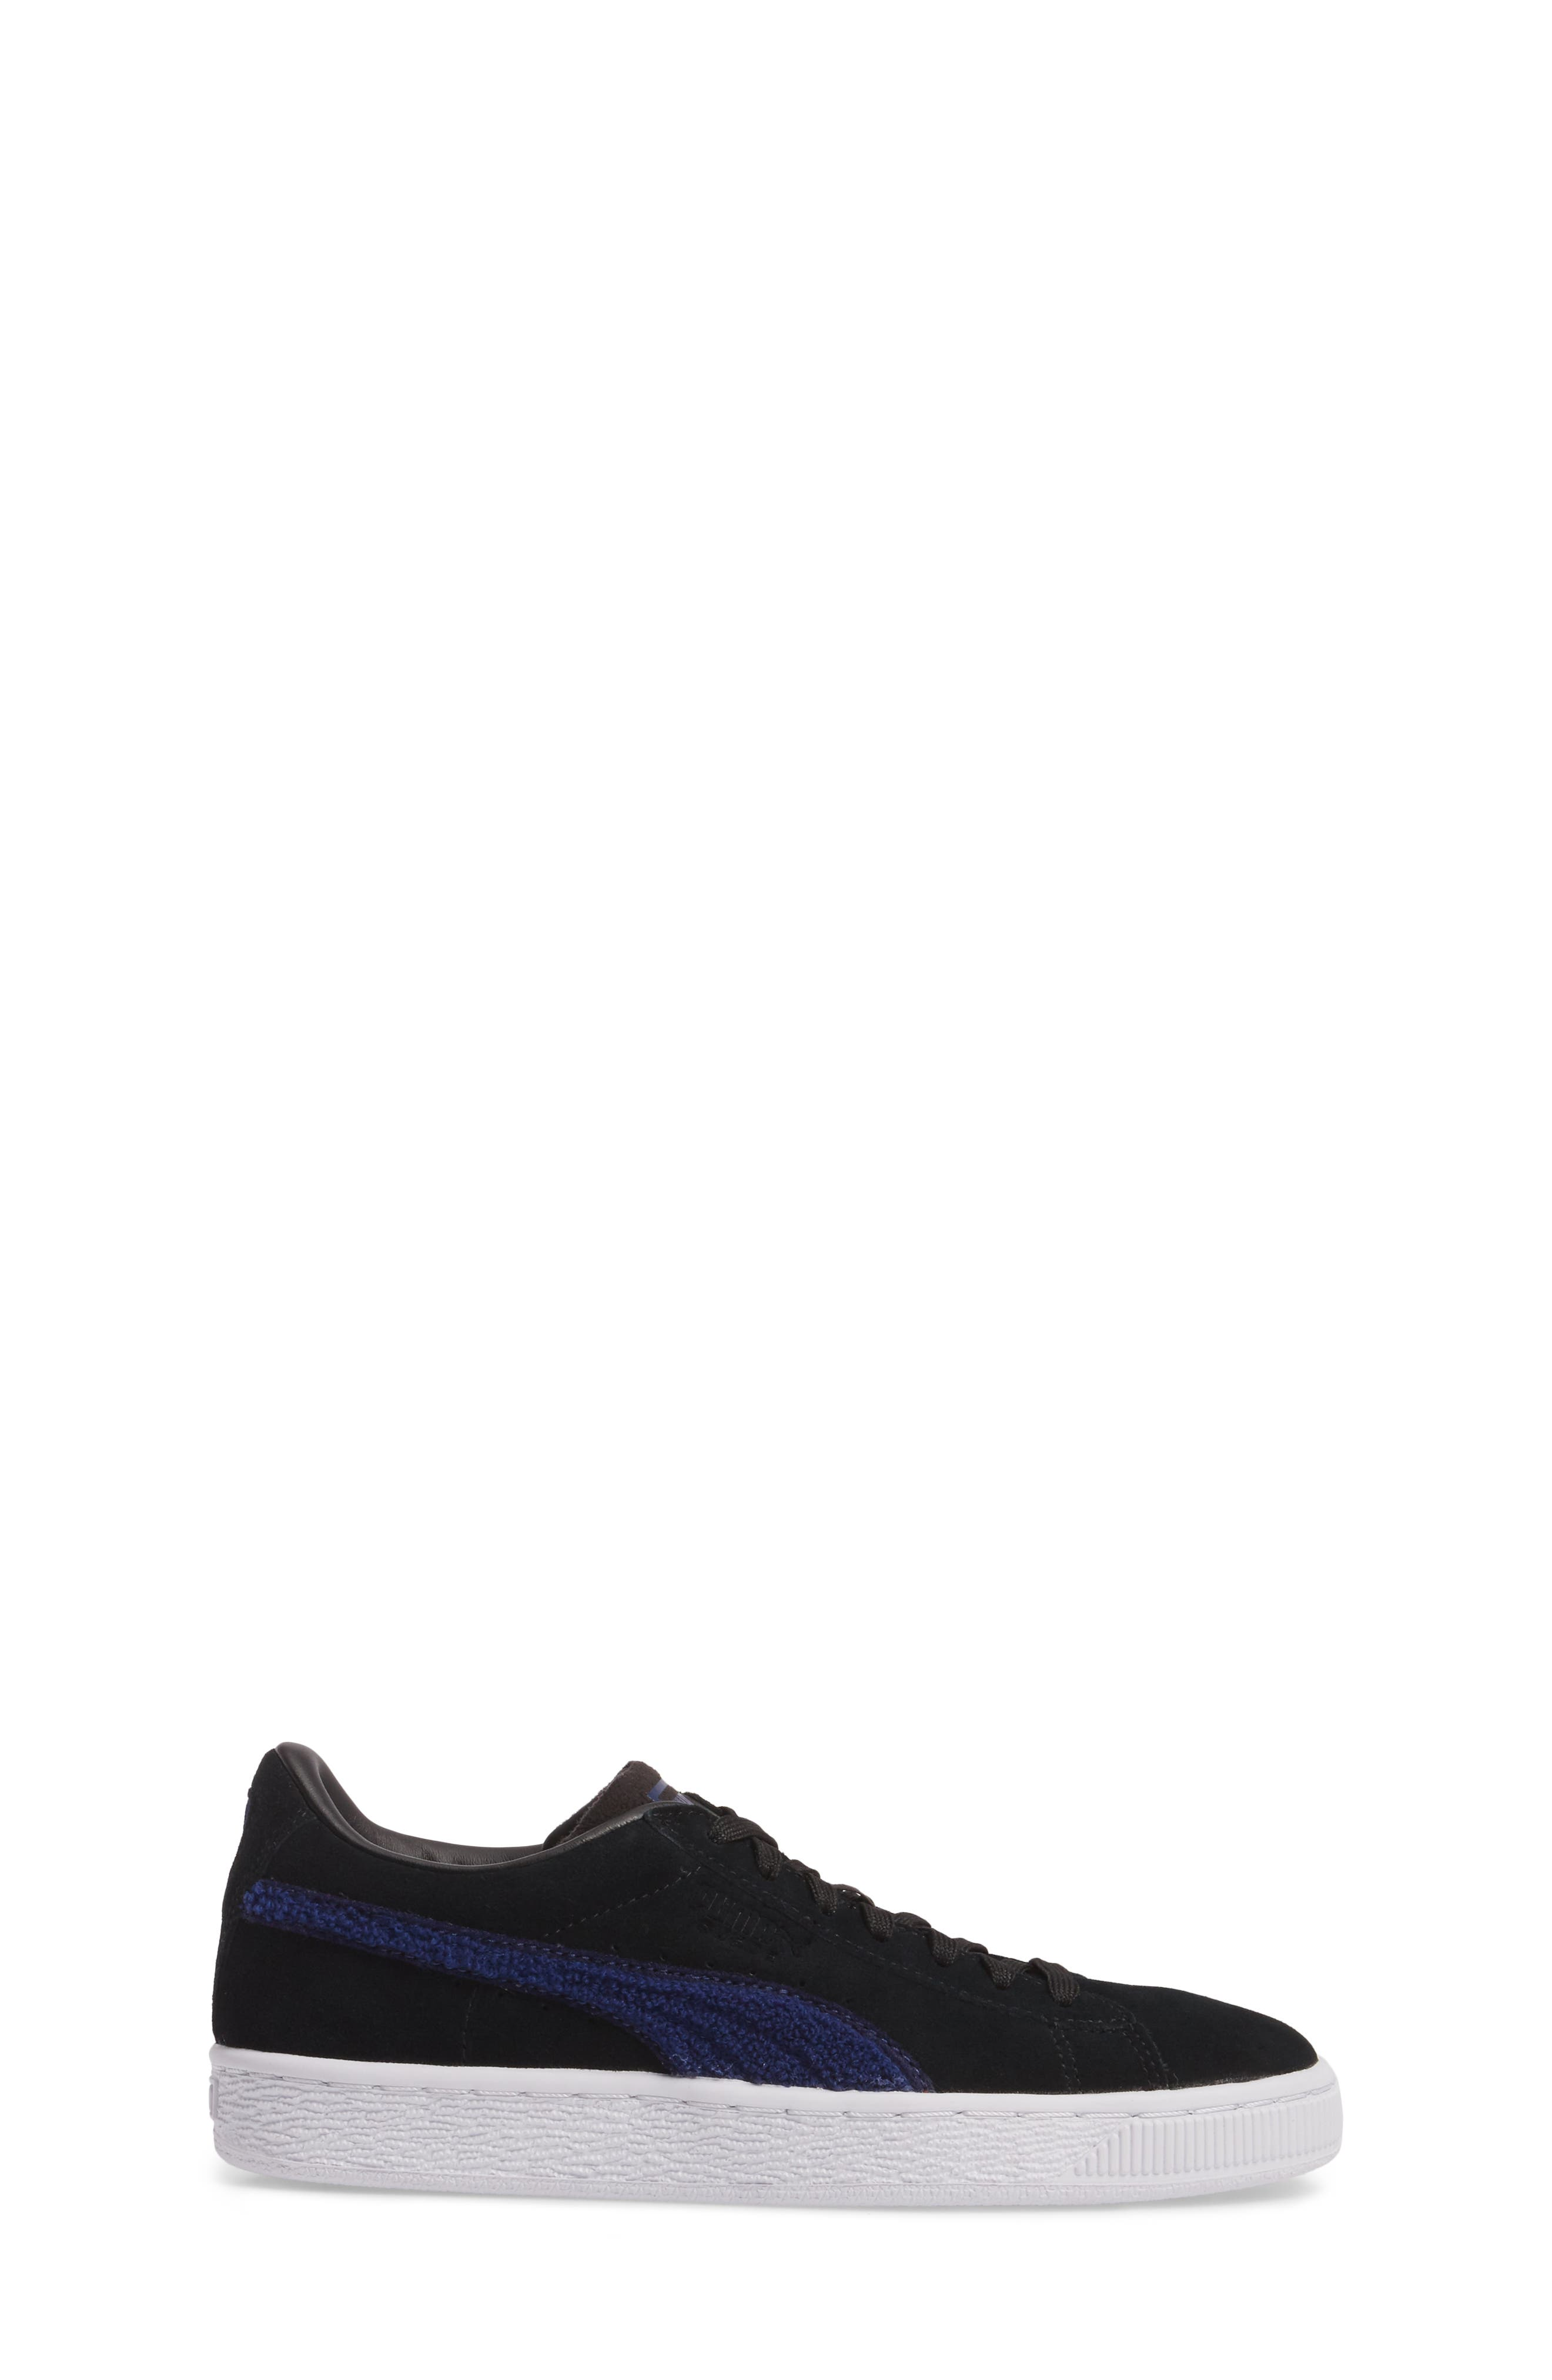 Classic Terry Jr Sneaker,                             Alternate thumbnail 3, color,                             Black